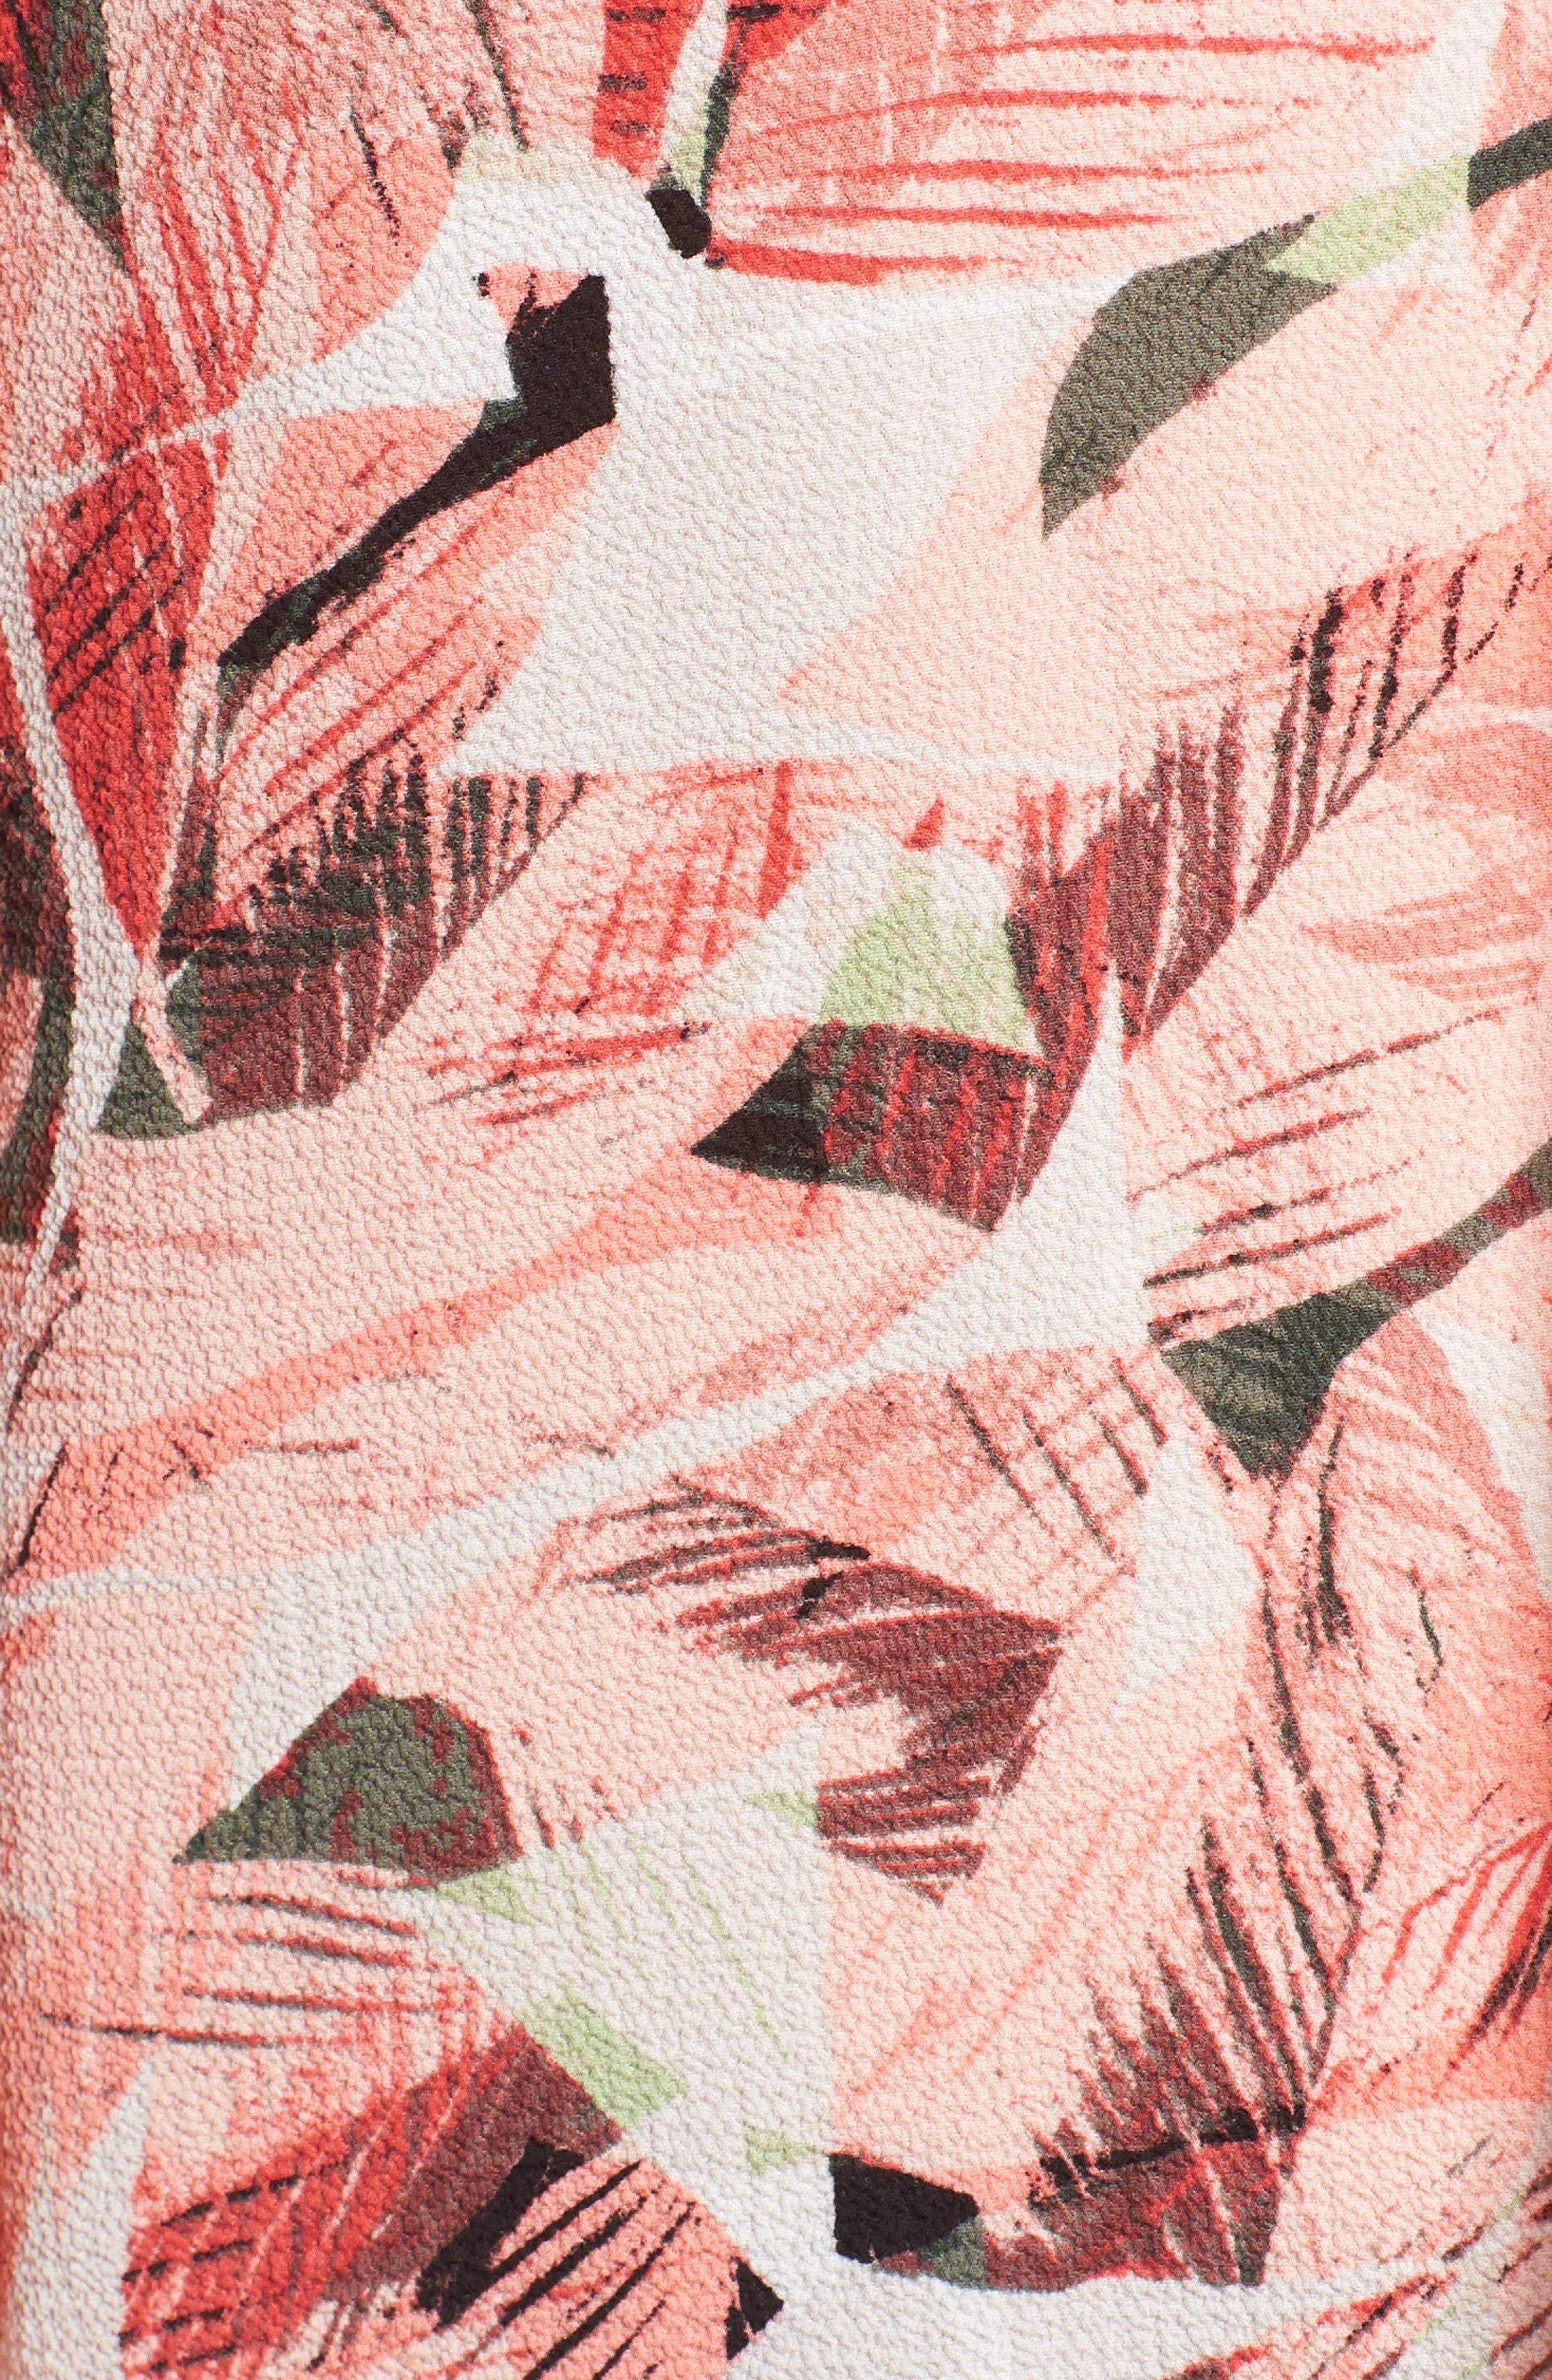 Tropical Print Pleated Sleeve Top,                             Alternate thumbnail 6, color,                             867-Sunrisepeach